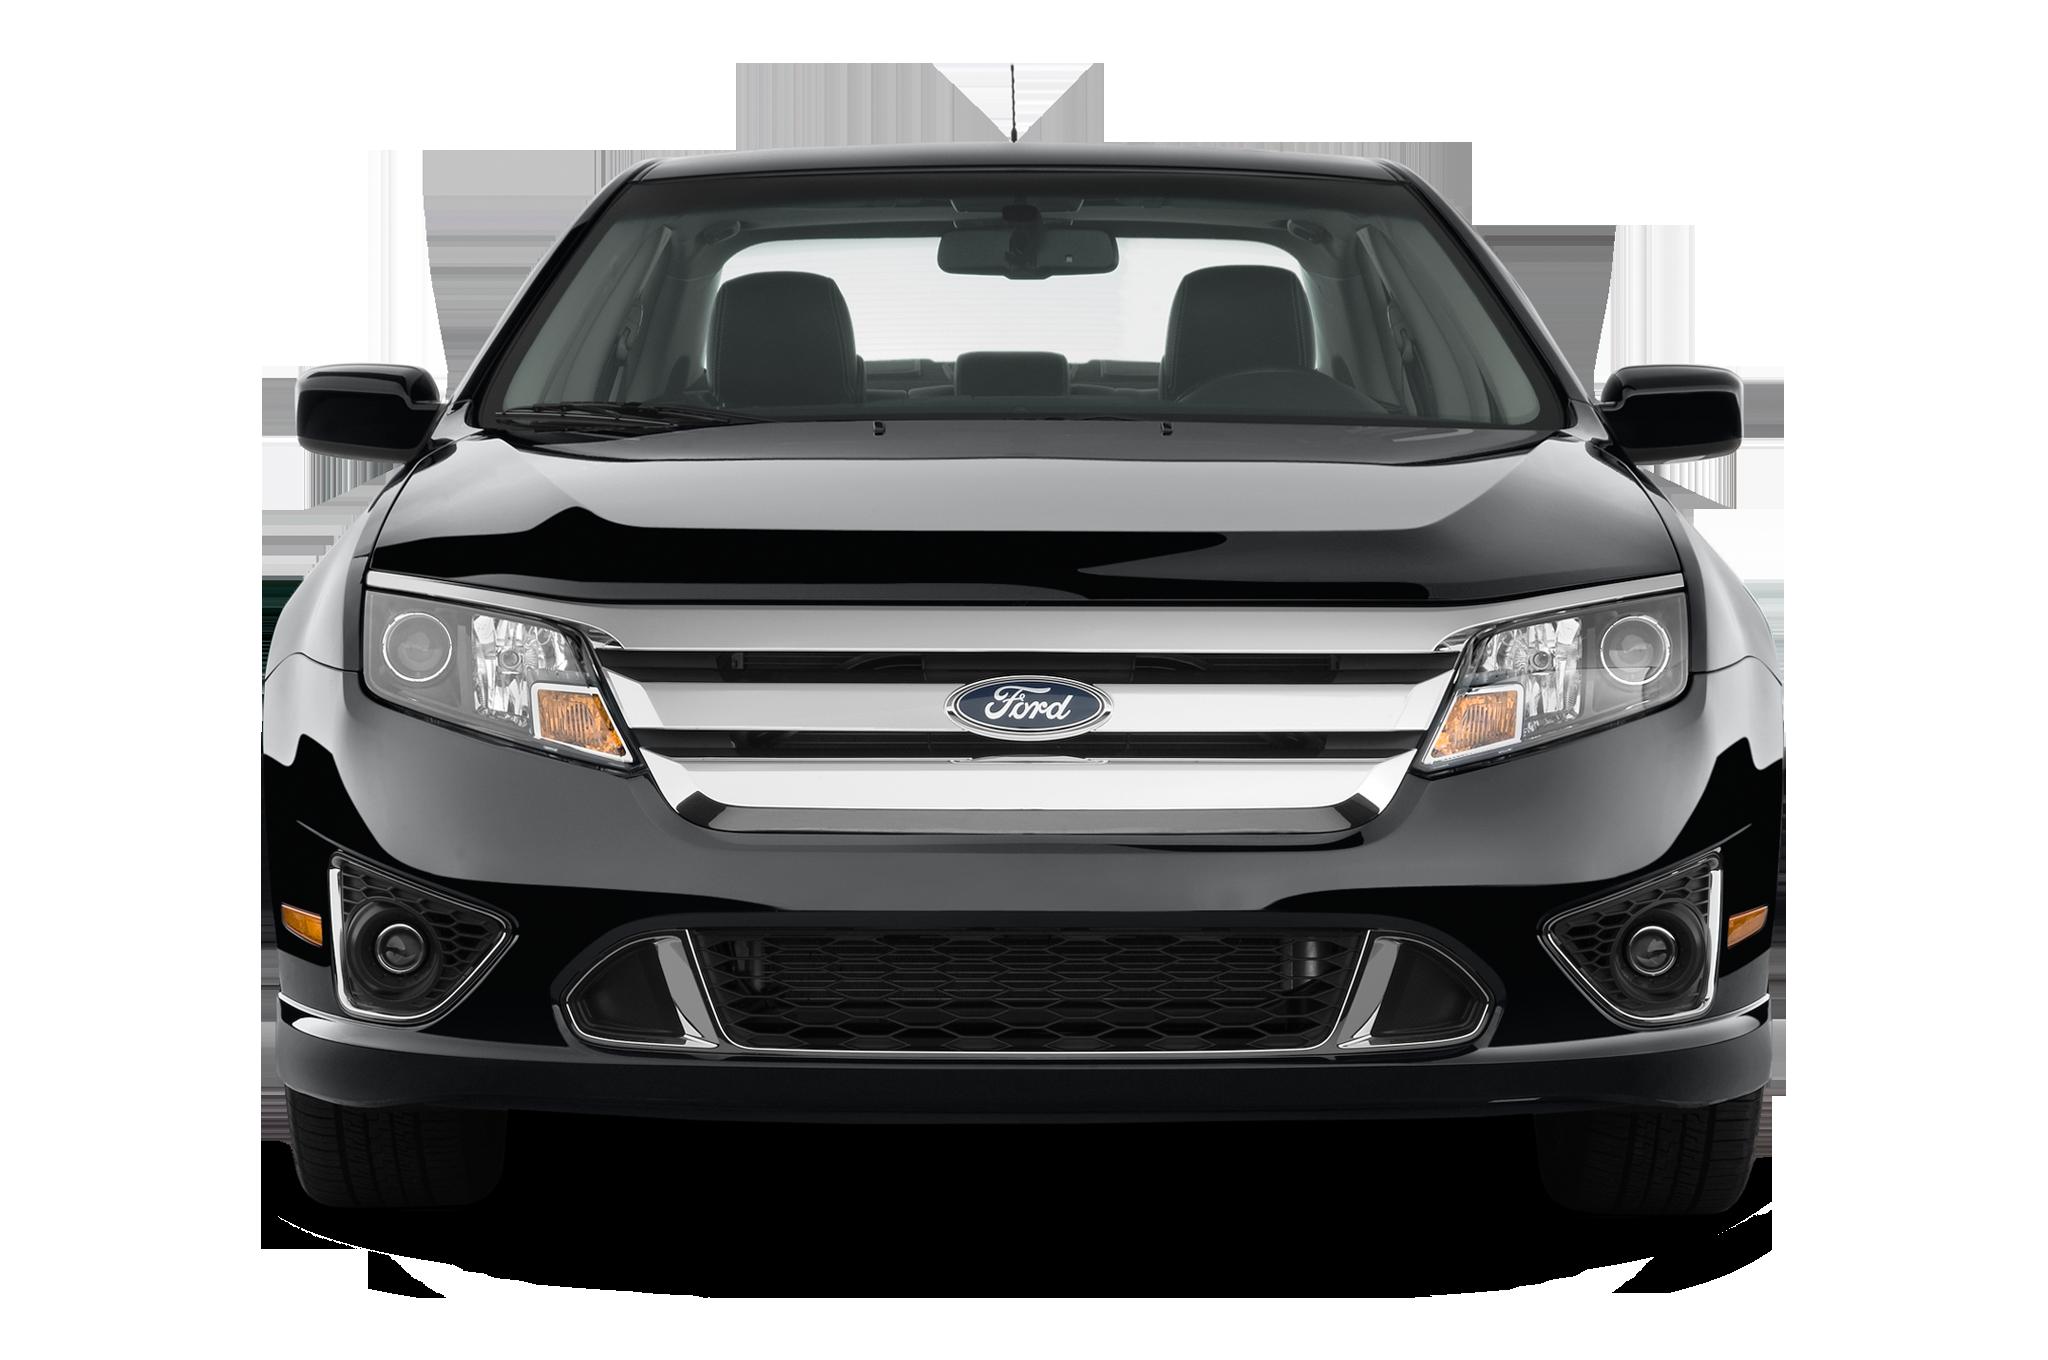 Ford Fusion (North America) I 2005 - 2012 Sedan #3